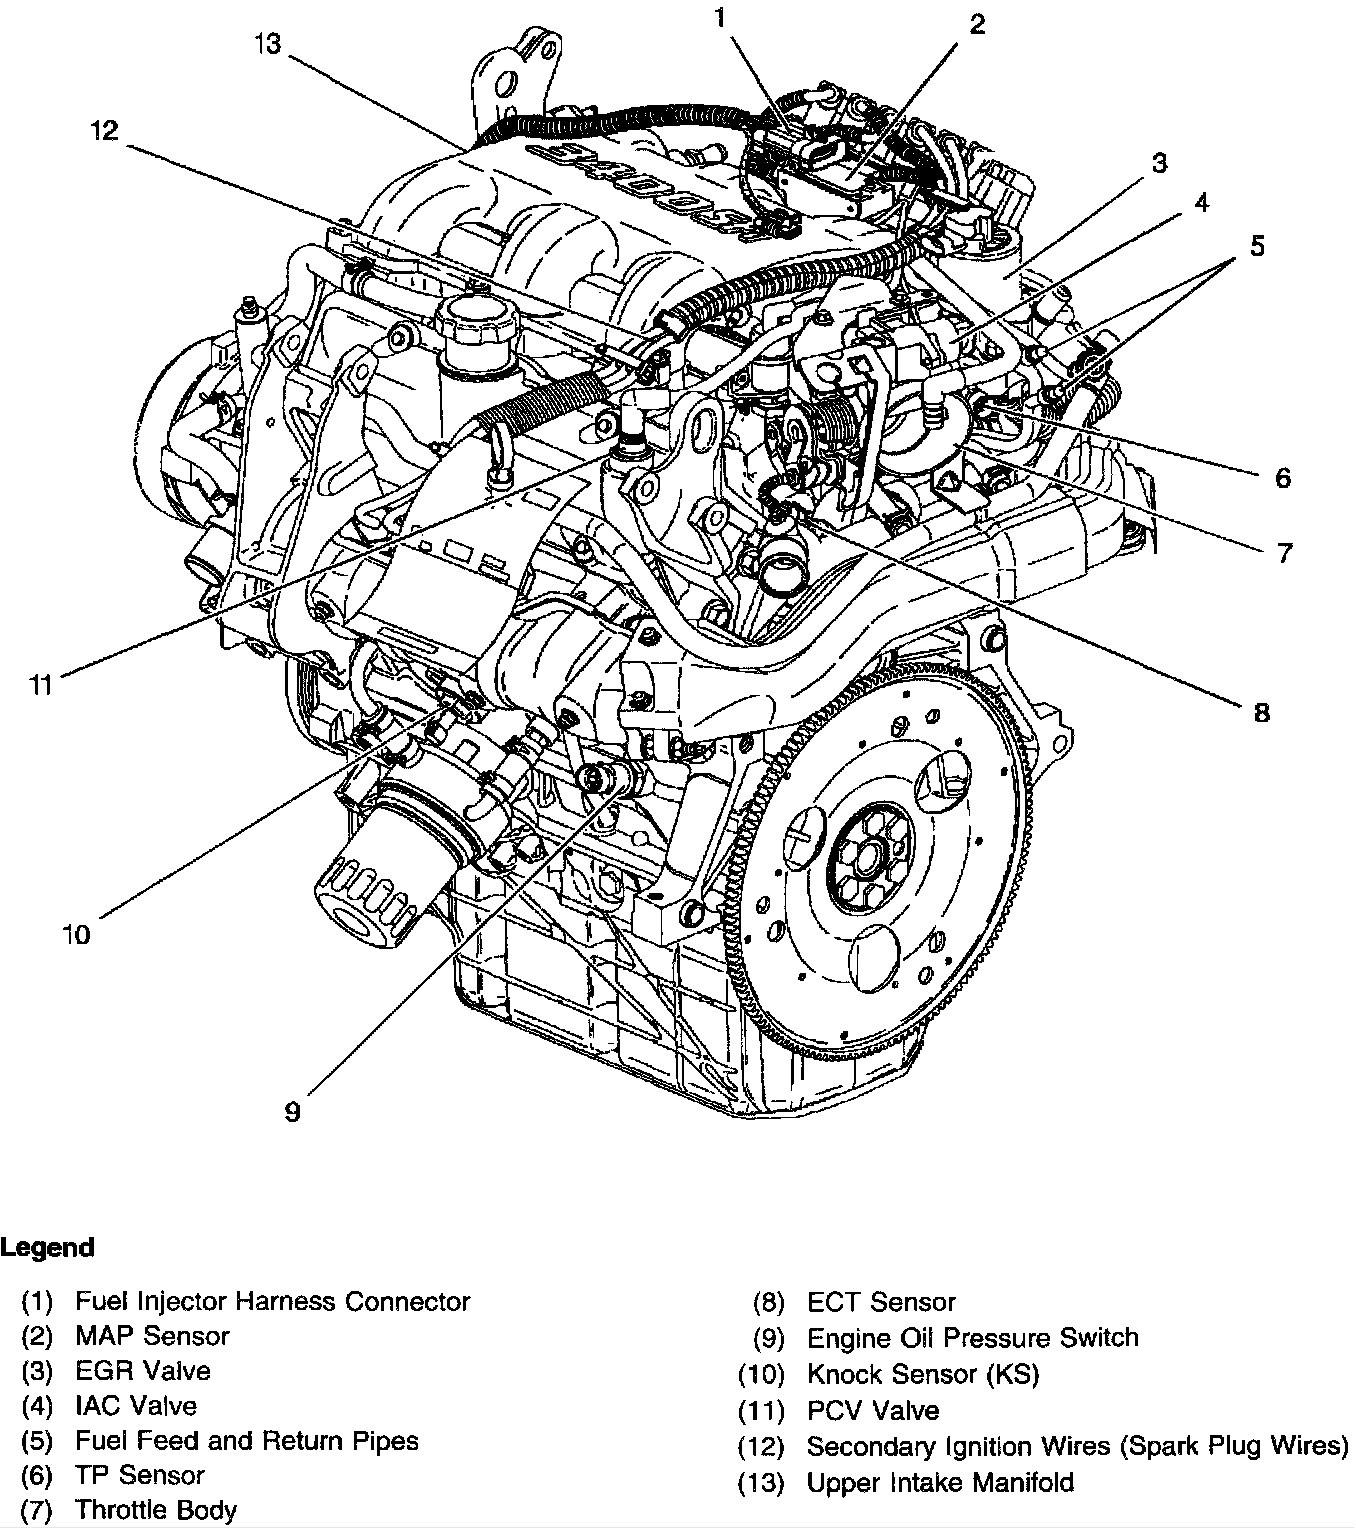 Chevy 5 3 Engine Diagram